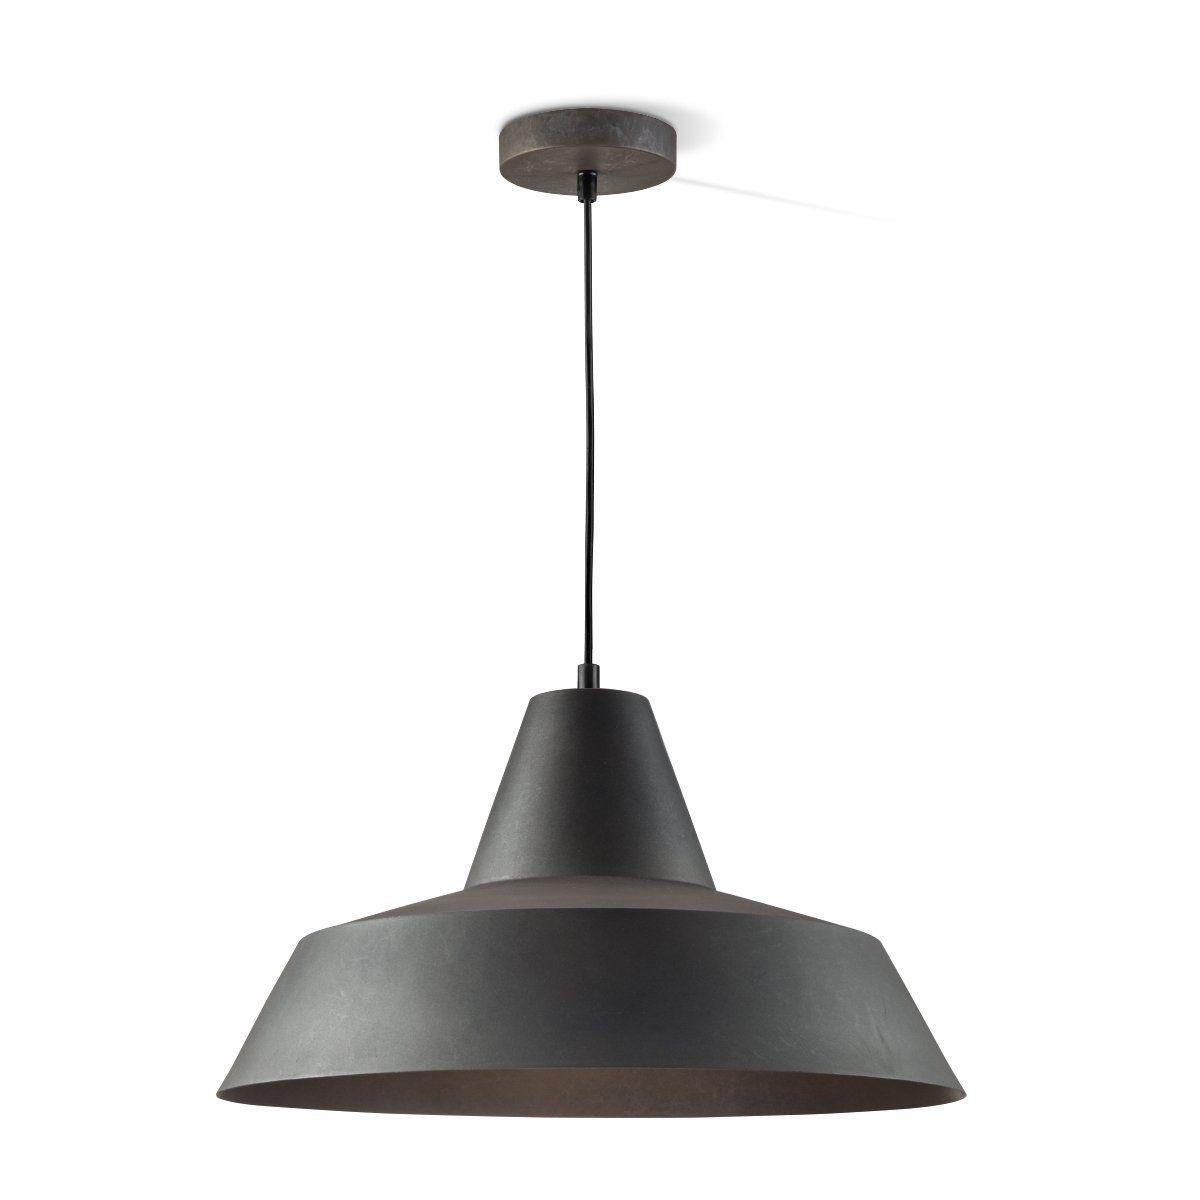 Home sweet home hanglamp Hat 40 - burned-metal